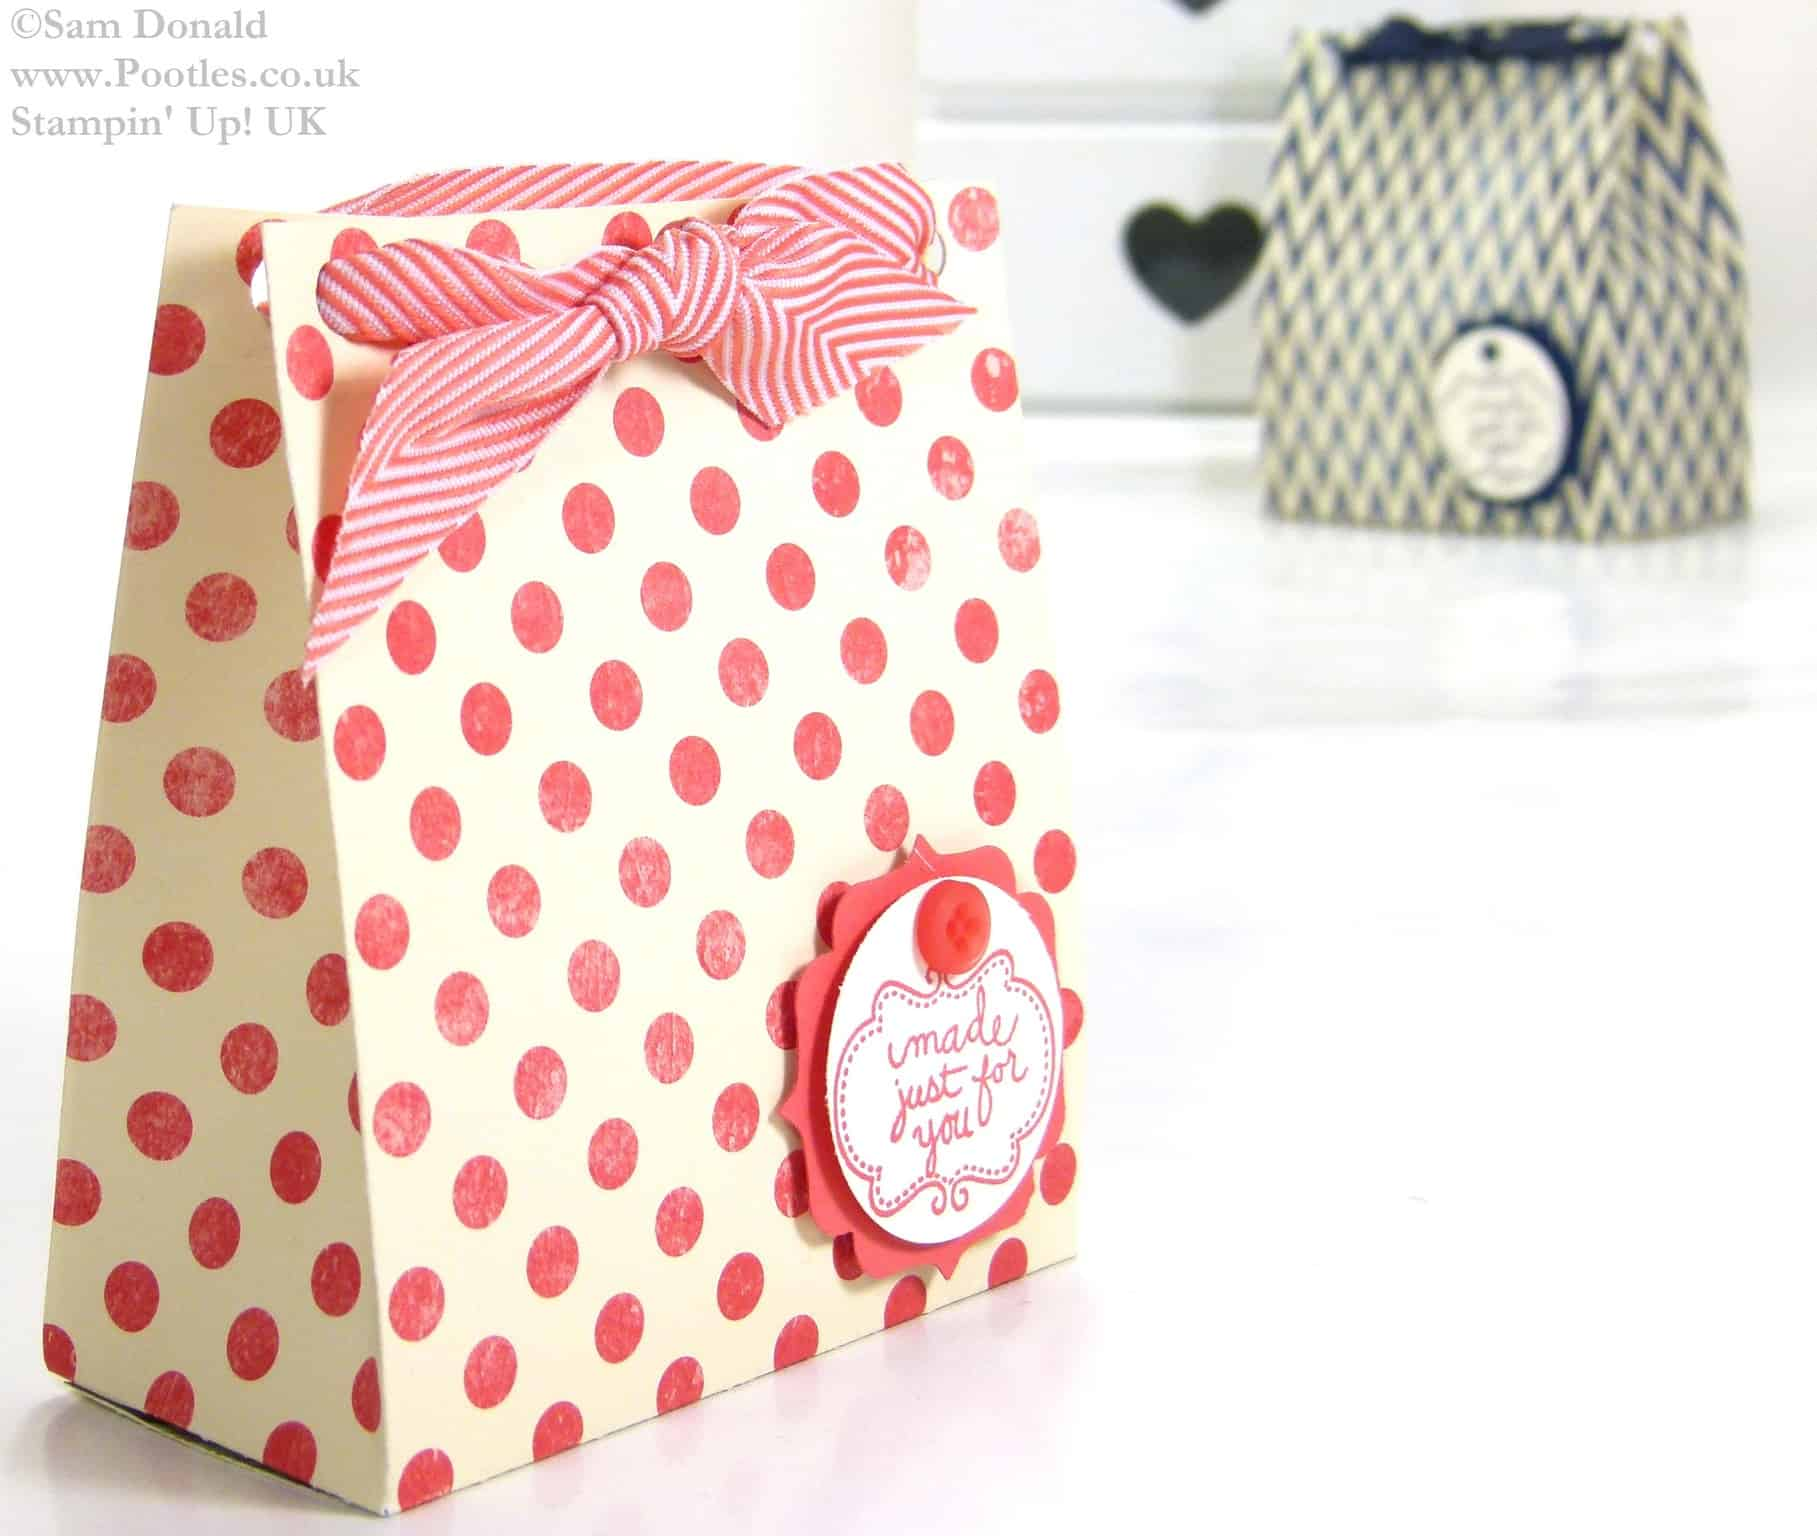 POOTLES Stampin Up UK Soap Gift Treat Bag Tutorial 3